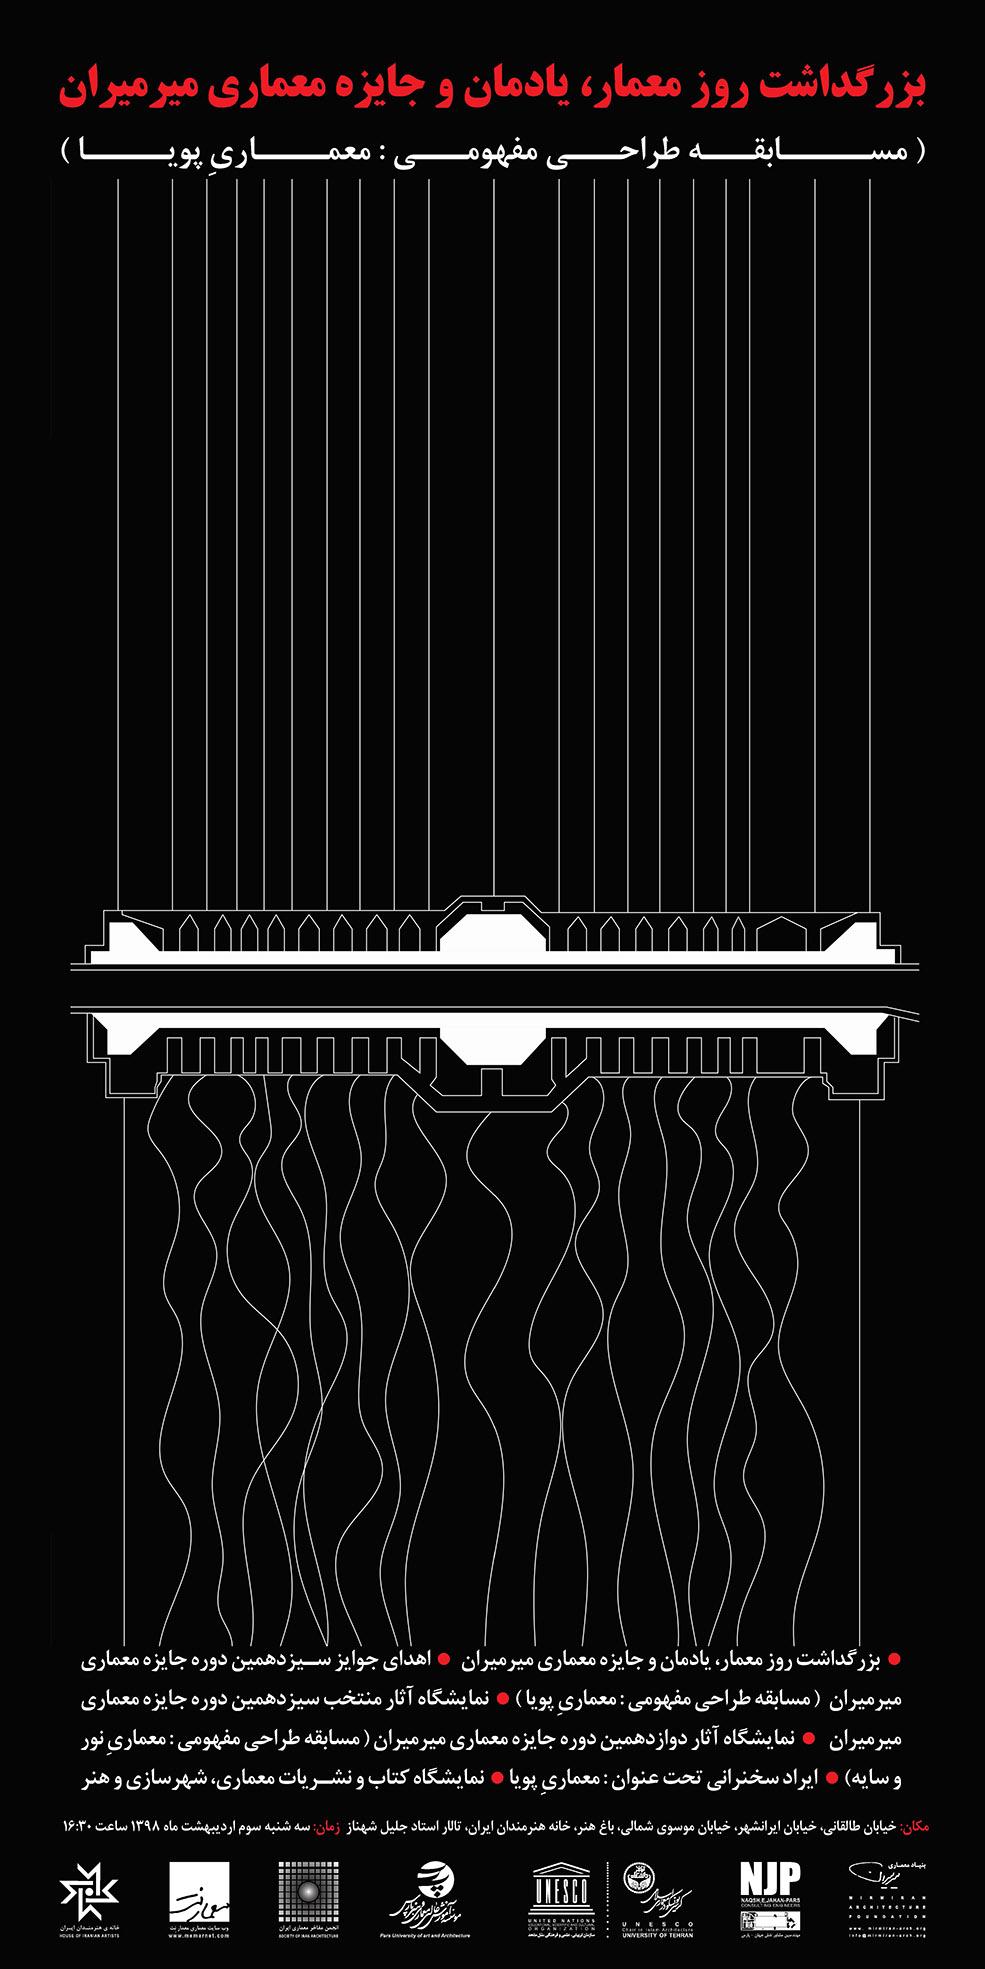 اعلام نتایجسیزدهمین دوره جایزه معماری میرمیران معماری پویا